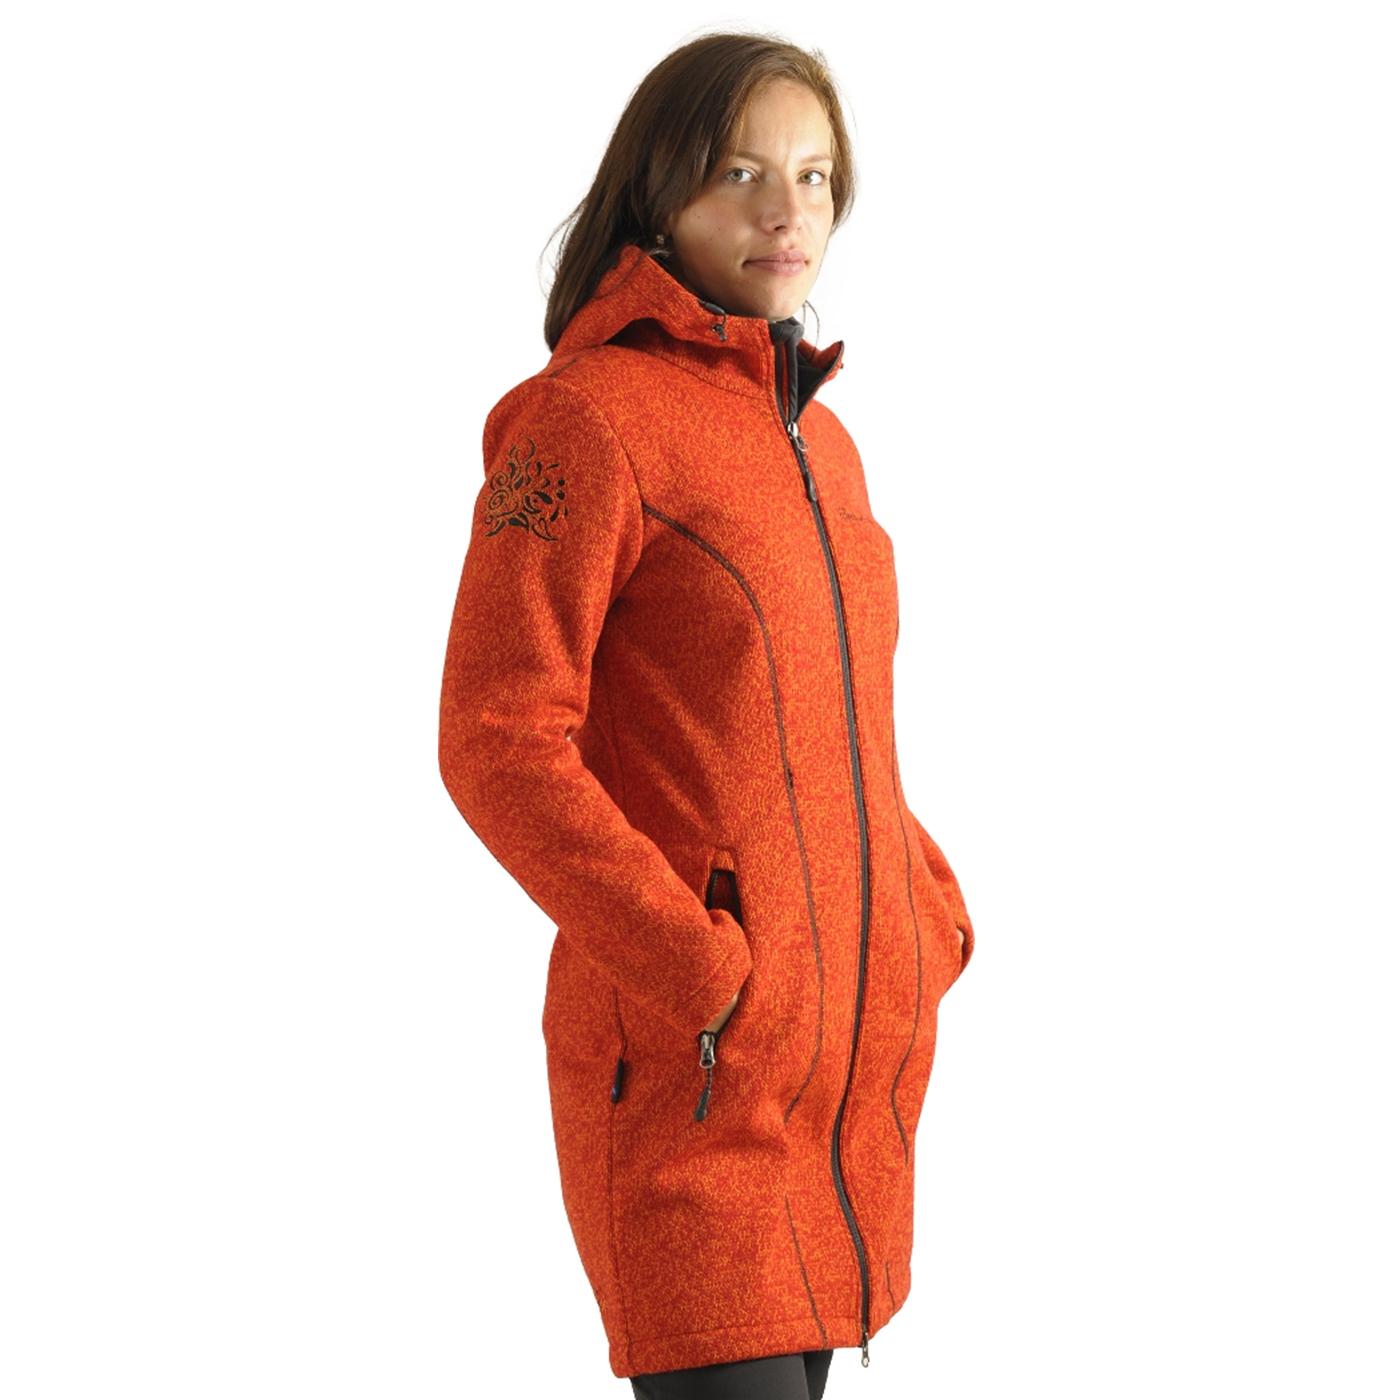 Benesport dámska bunda Pekelník - oranžová, veľkosť XL